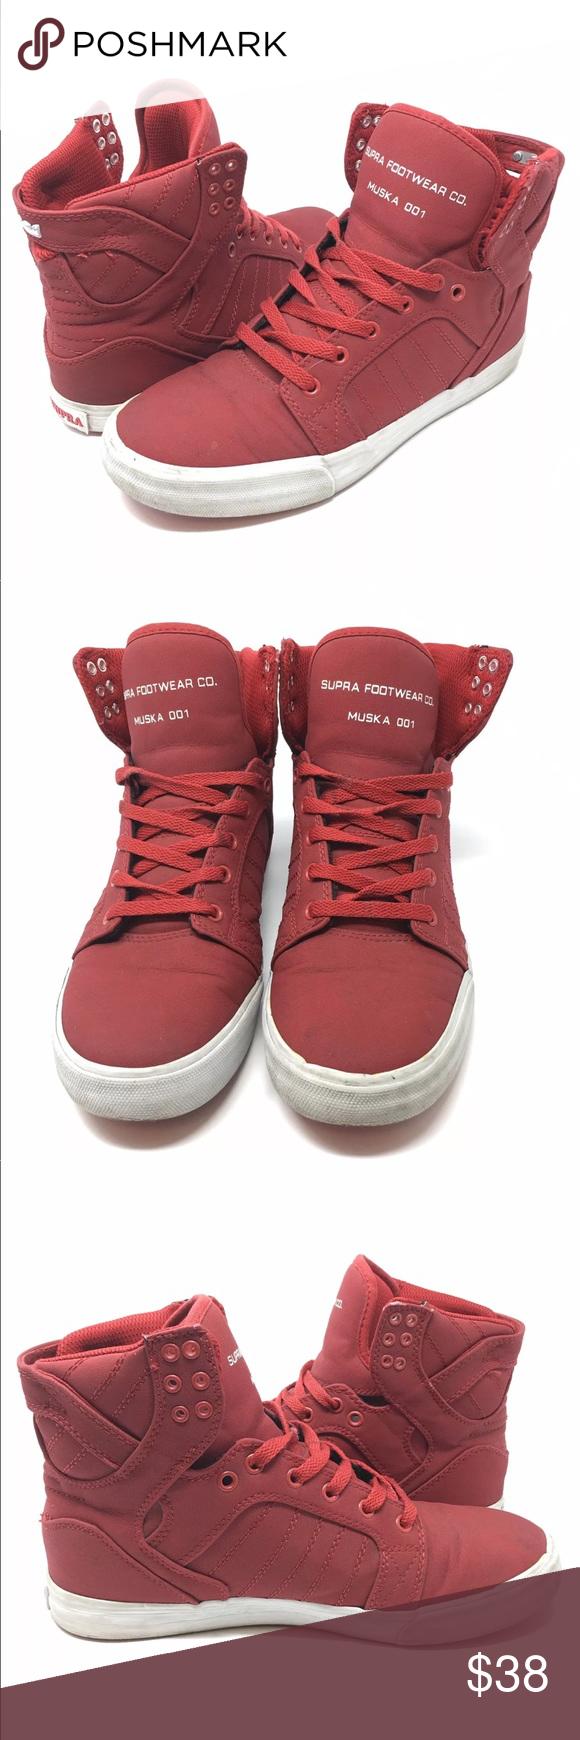 Supra Footwear Co. Men's Muska 001 Red